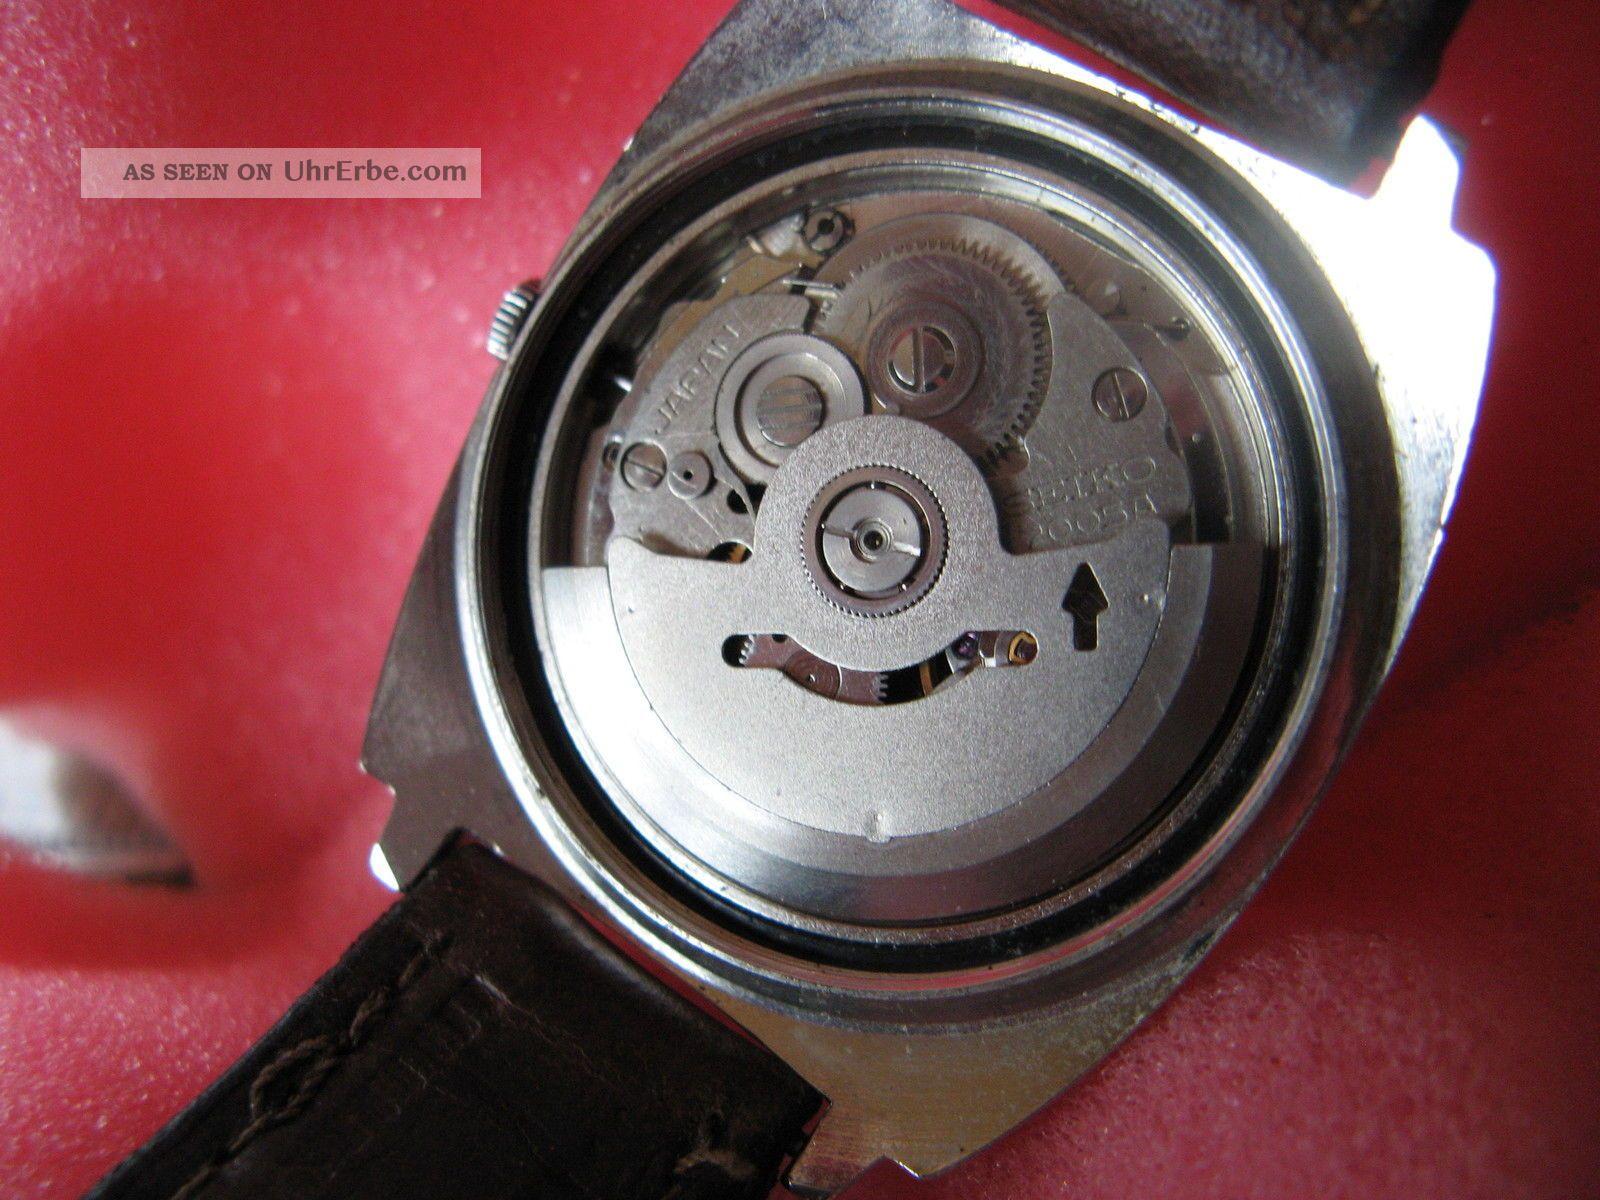 Seiko Automatik Herrenuhr Top LÄuft Armbanduhren Bild